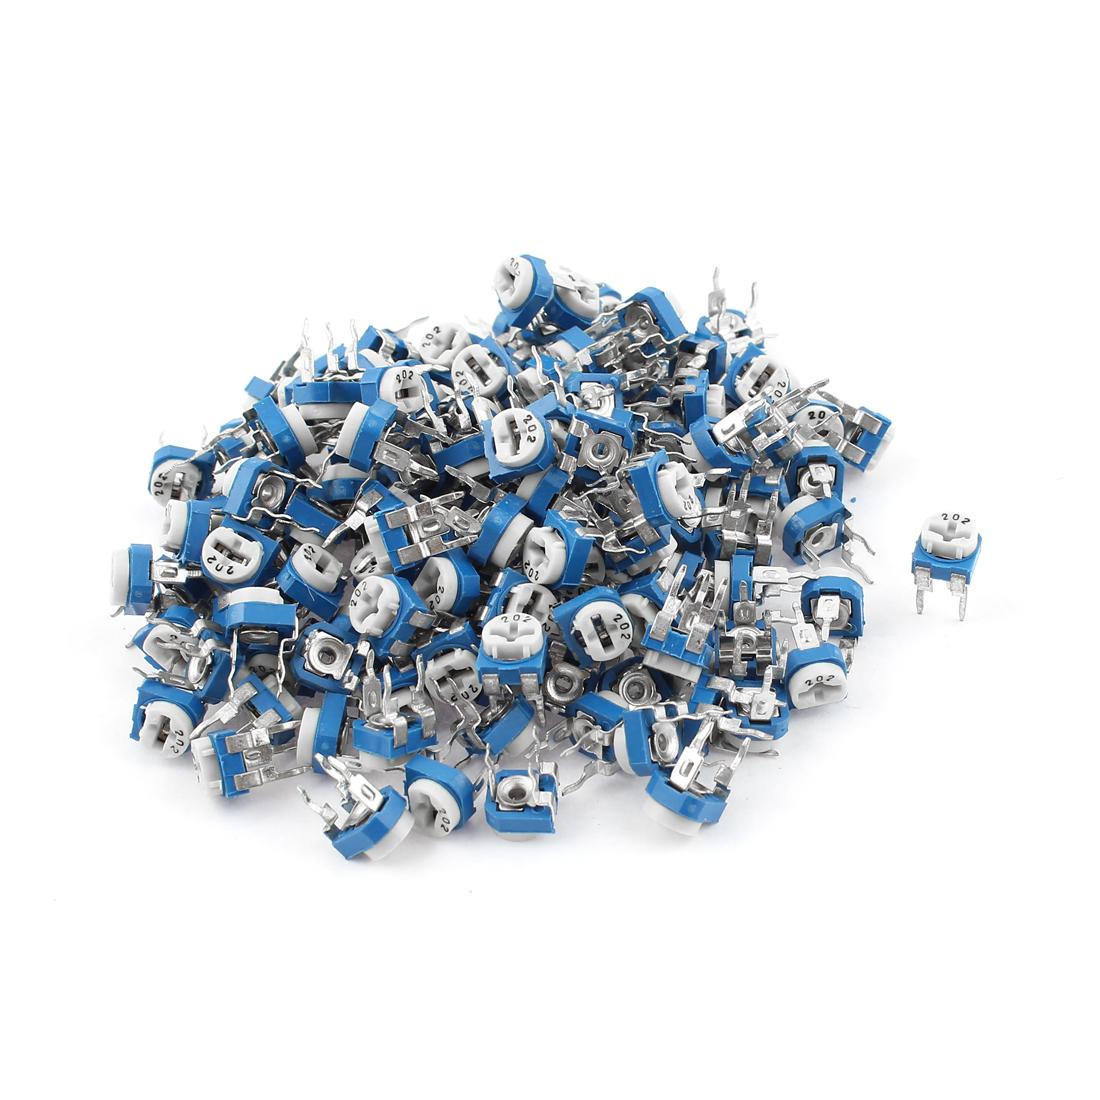 150Pcs 2K ohm Vertical PCB Preset Variable Resistor Trimmer Potentiometer Blue